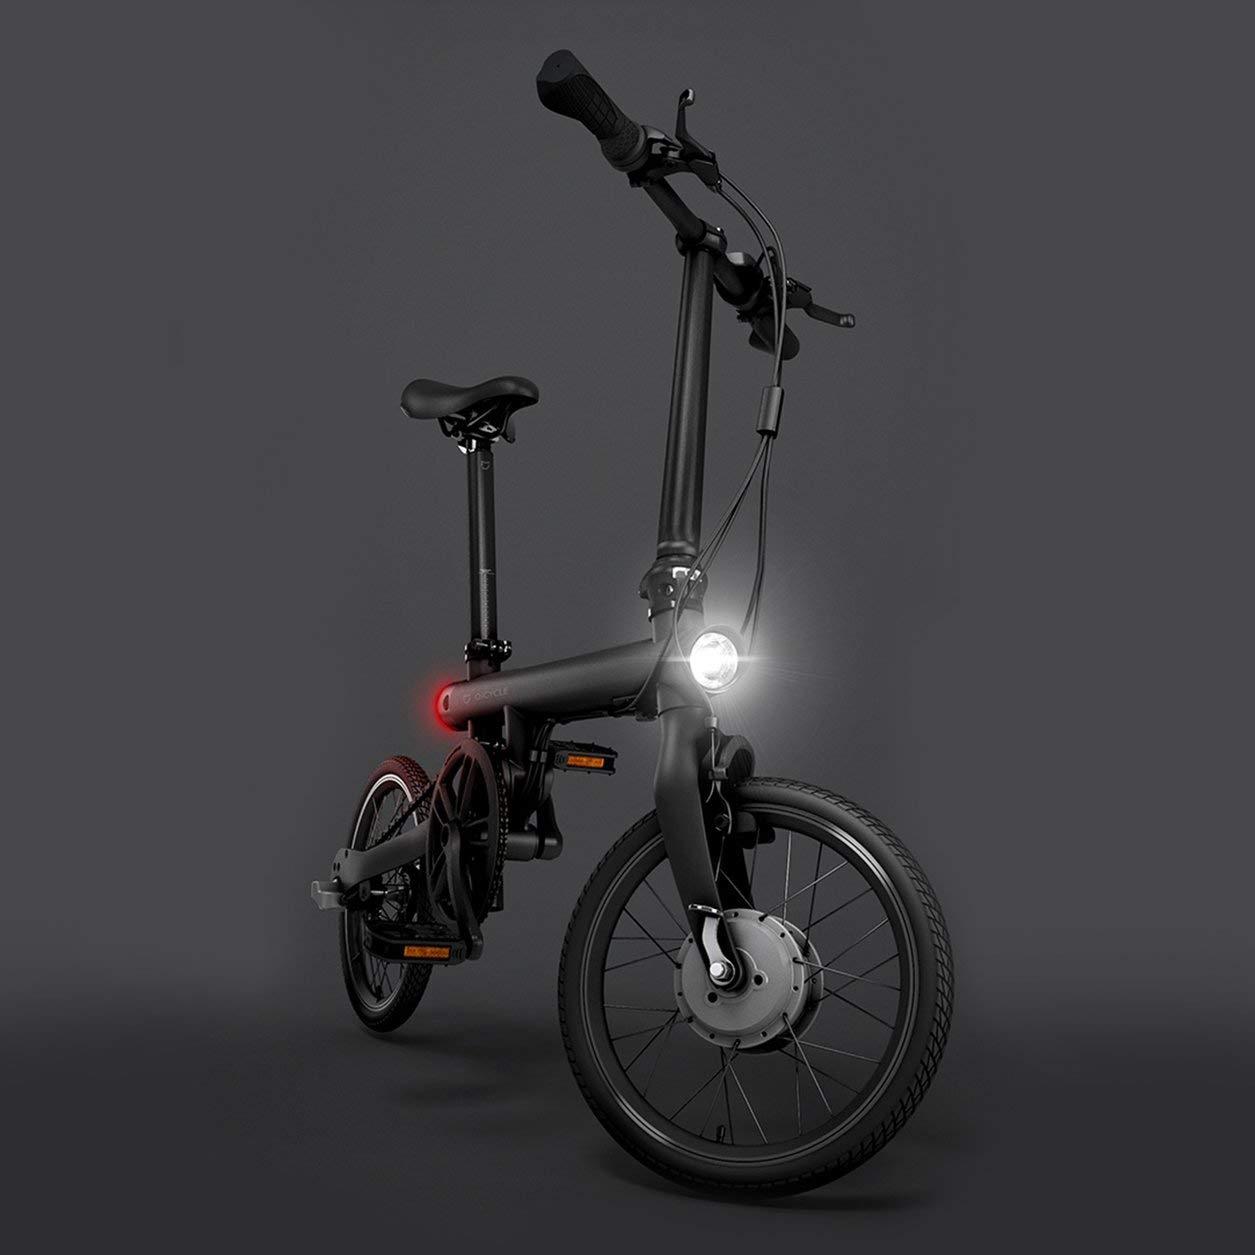 Dailyinshop Xiaomi Mi Plegable eléctrica Inteligente Bicicleta Plegable Bicicleta E-Bike luz de la Bicicleta 18